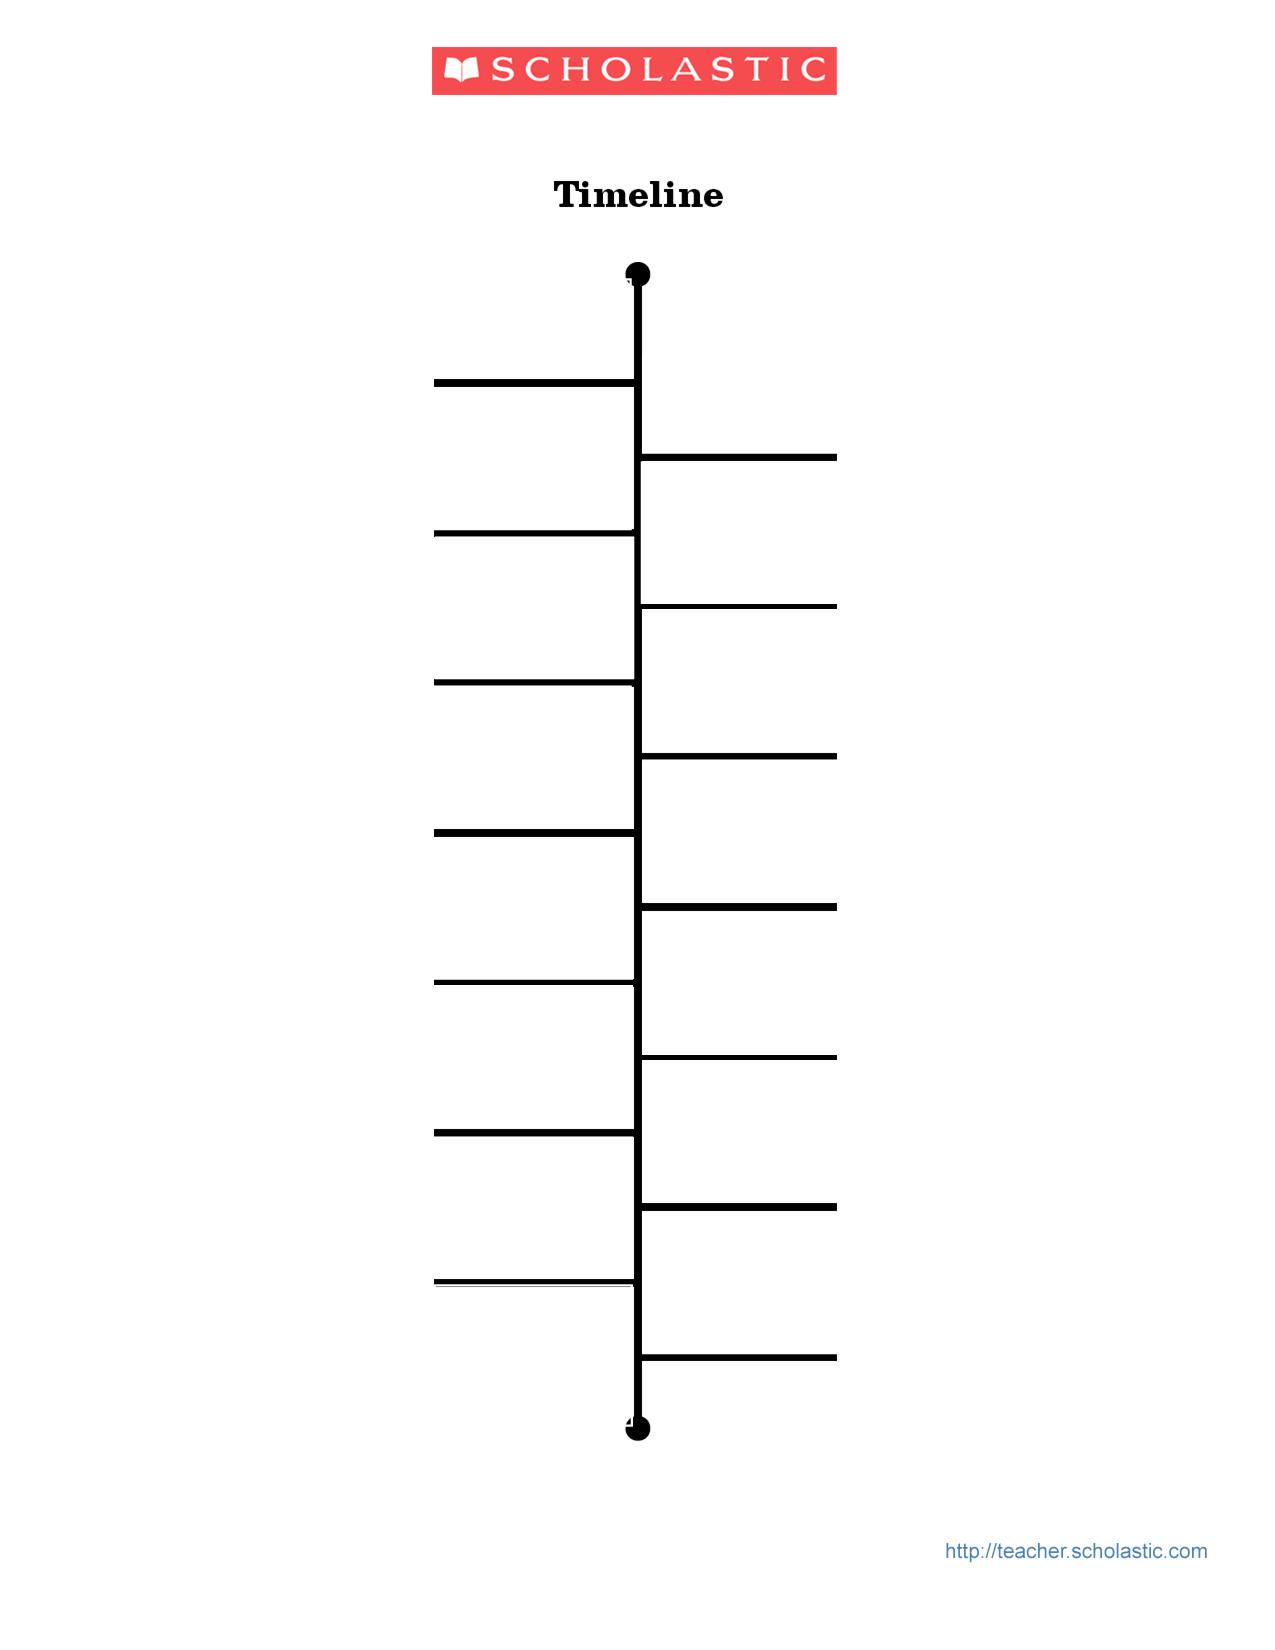 Chronological Timeline Template Word